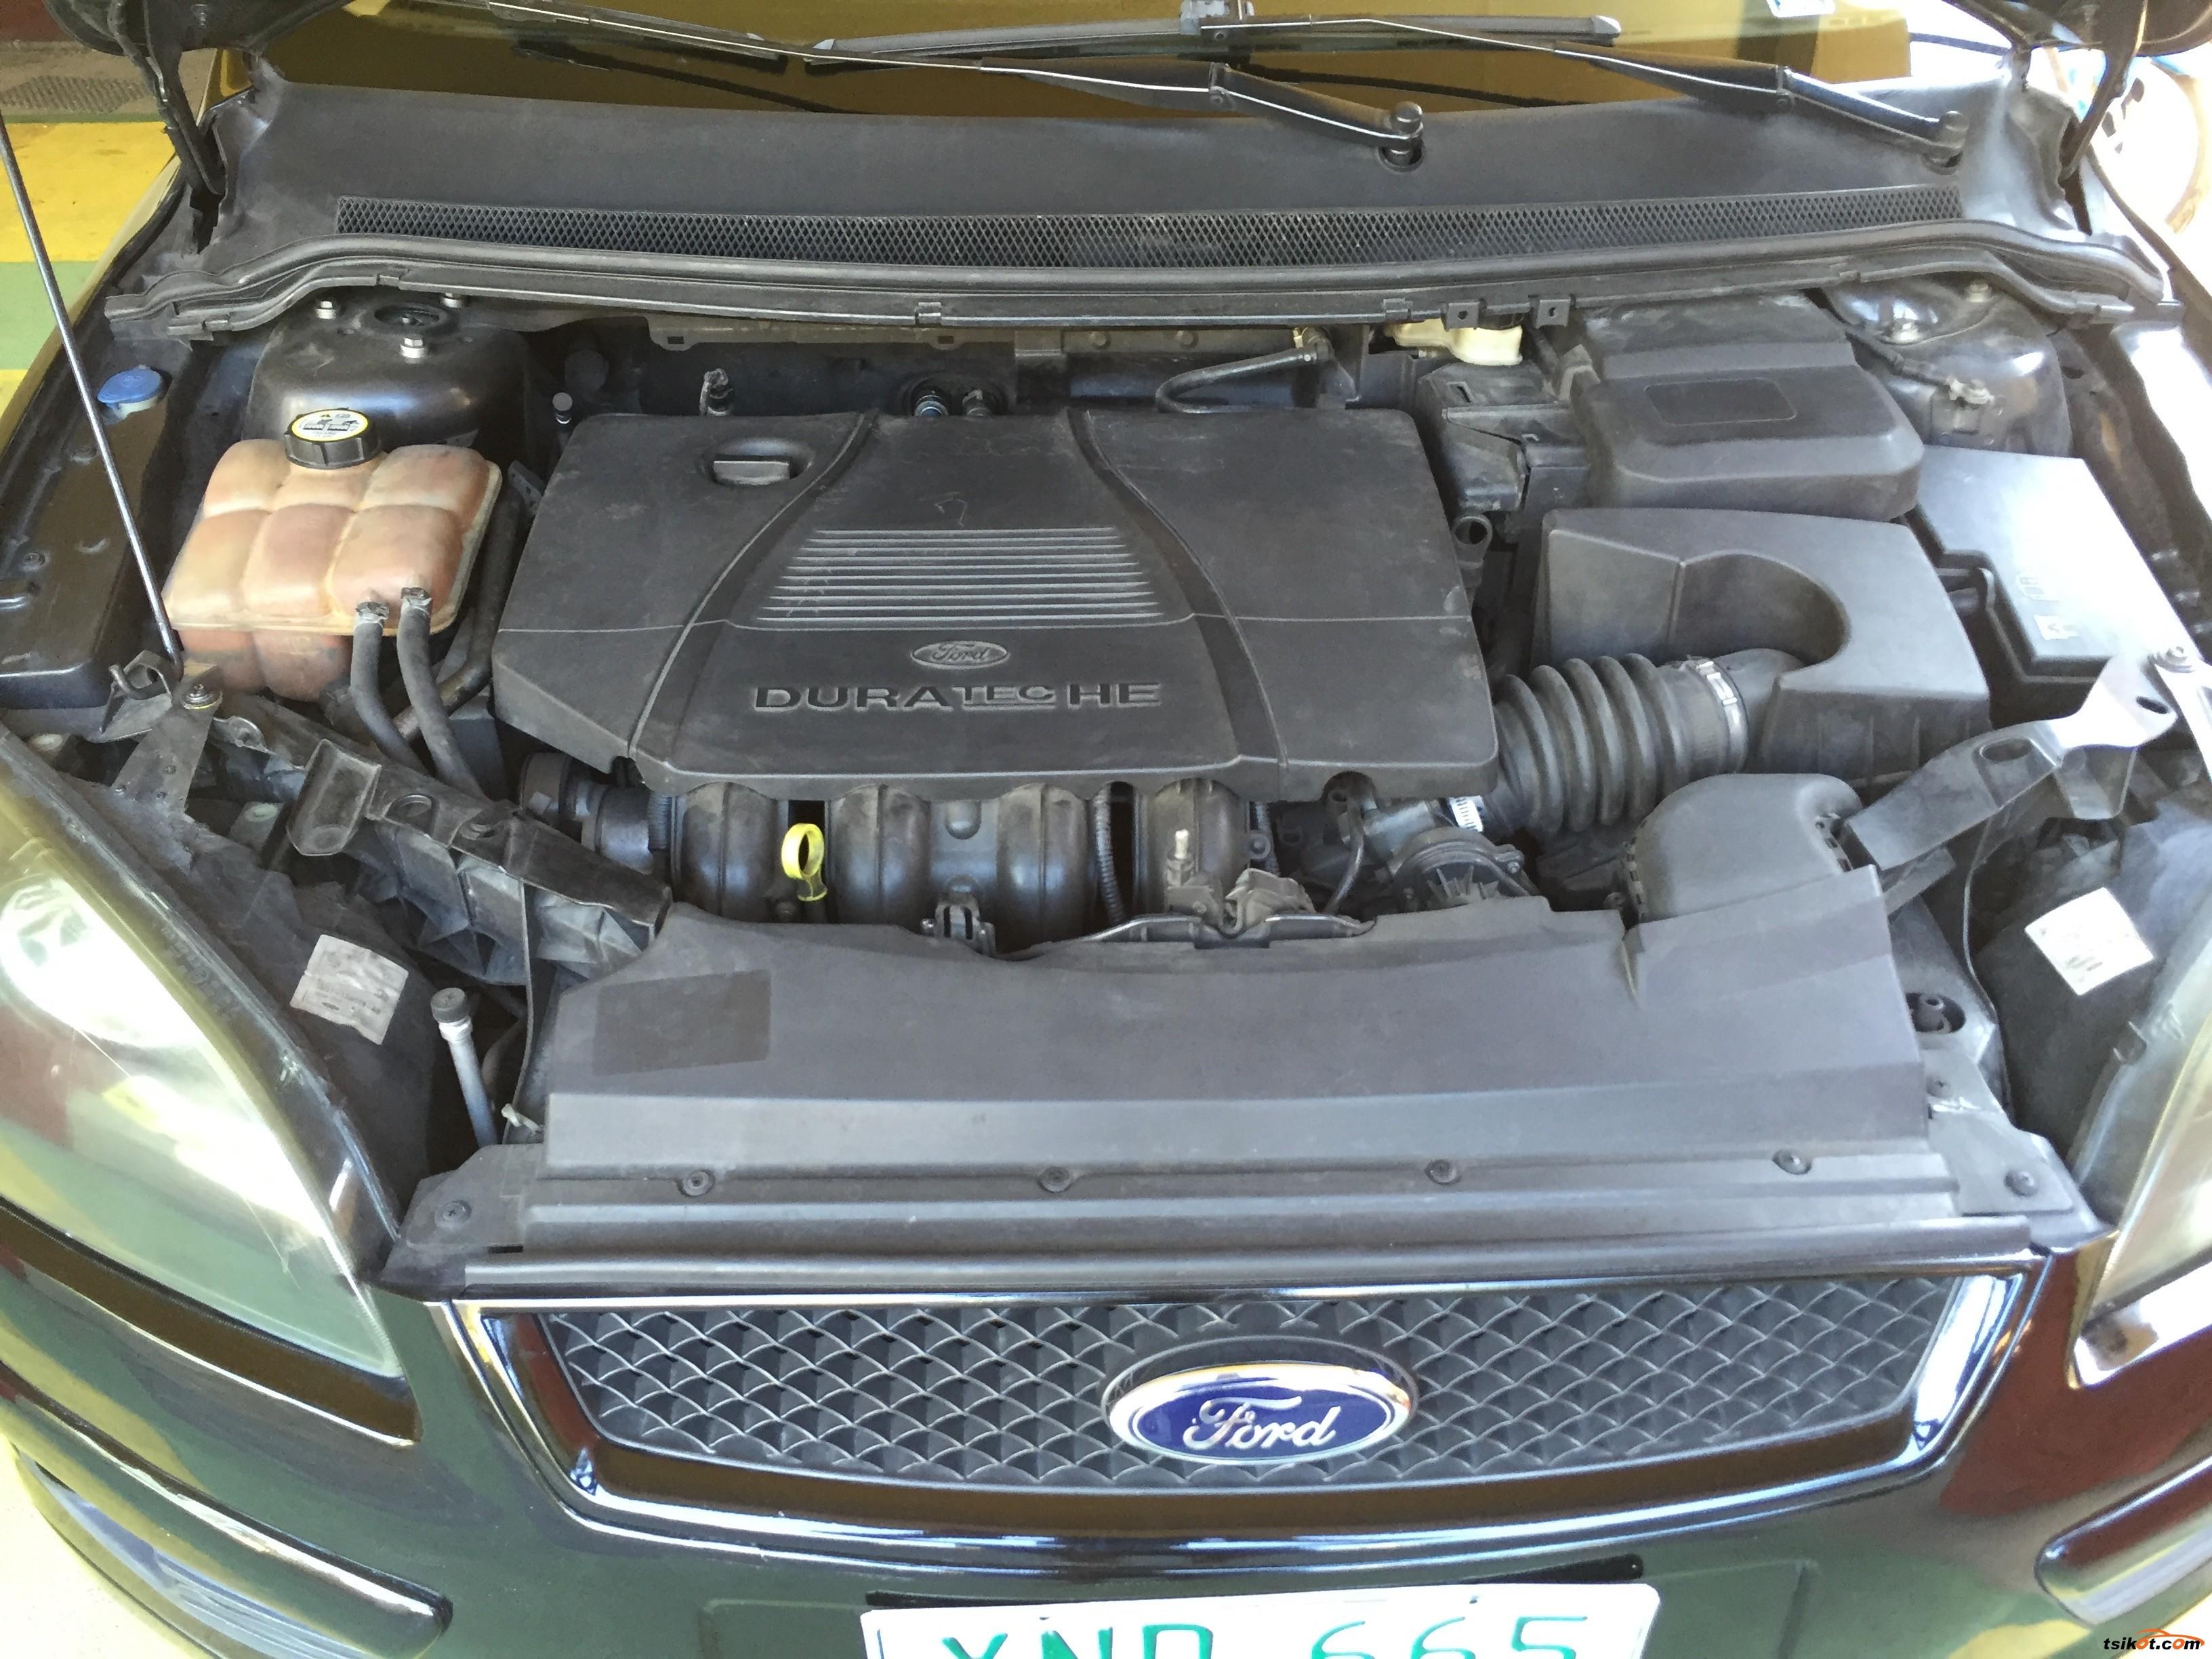 Ford Focus 2005 - 8